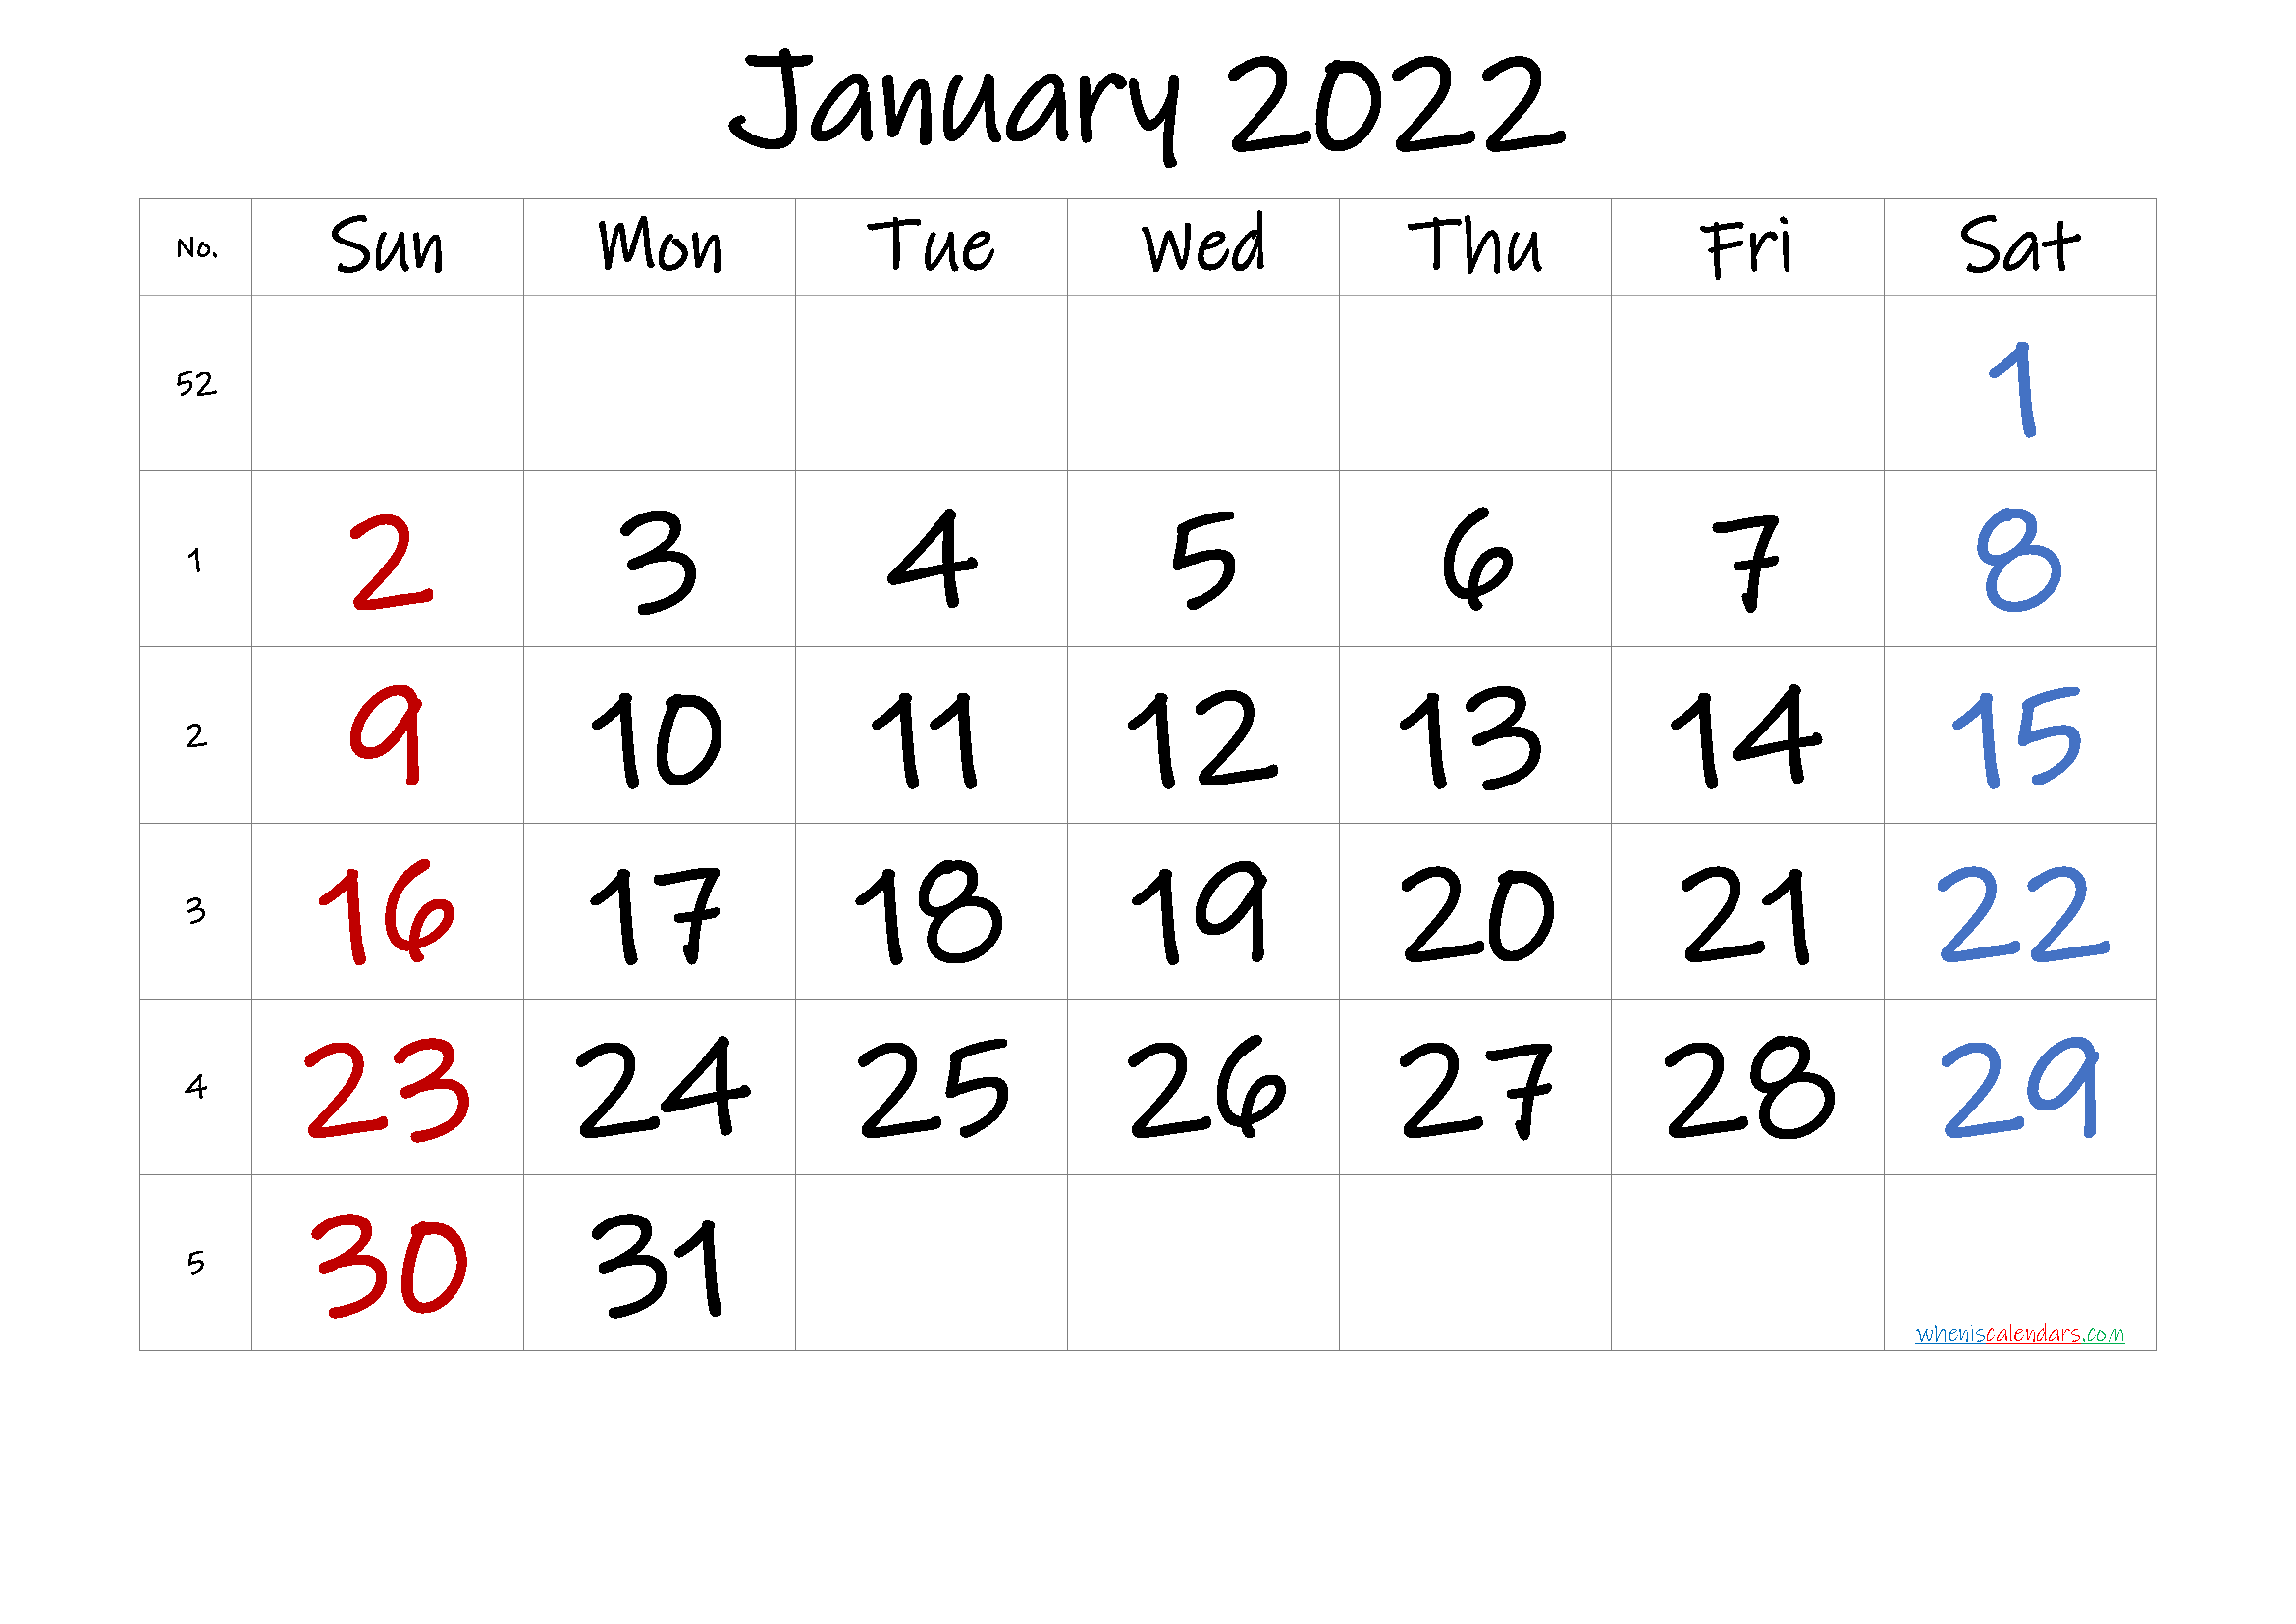 Free January 2022 Calendar [Free Premium] Throughout Images Of January 2022 Calendar